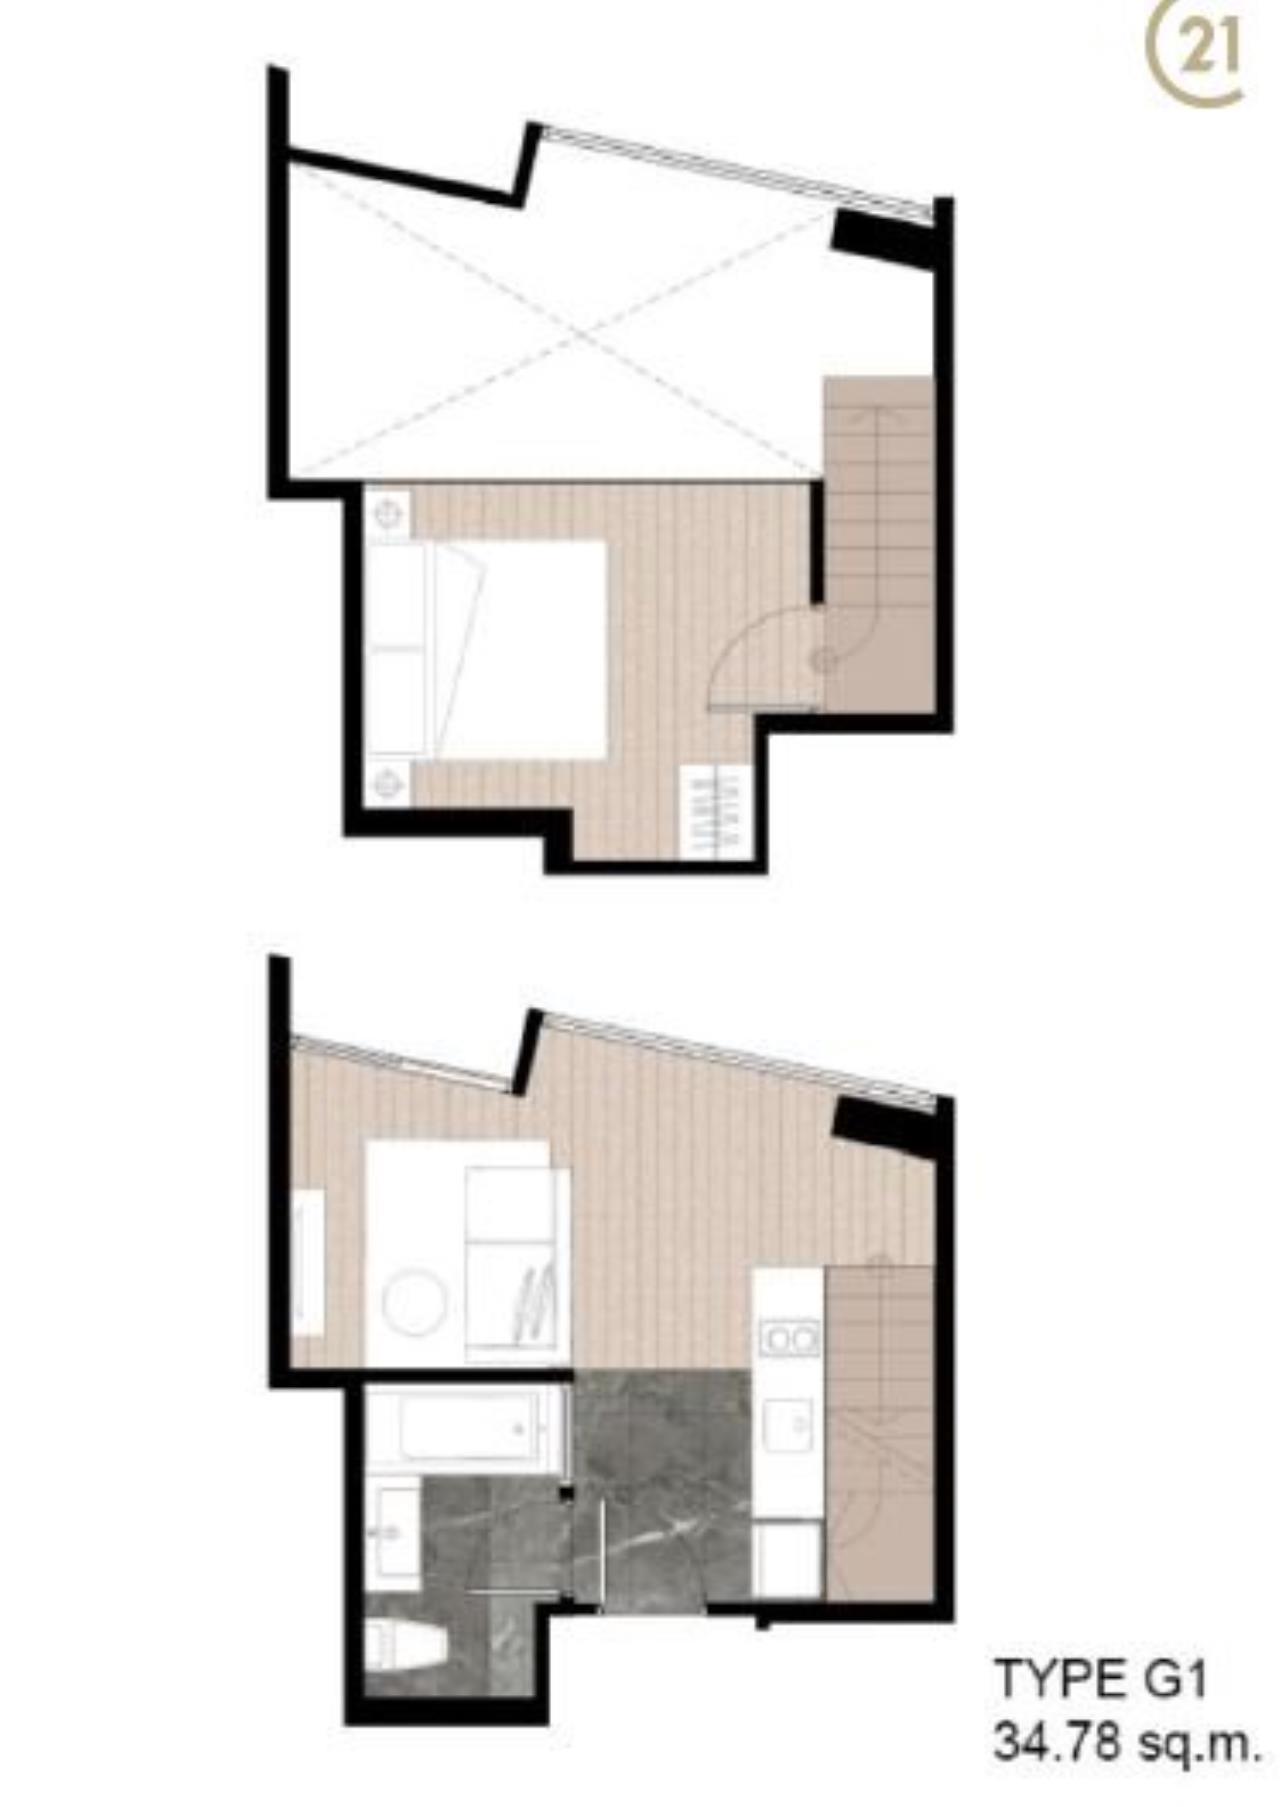 Century21 Skylux Agency's Walden Sukhumvit 39 / Condo For Sale / 1 Bedroom / 34.78 SQM / BTS Phrom Phong / Bangkok 2